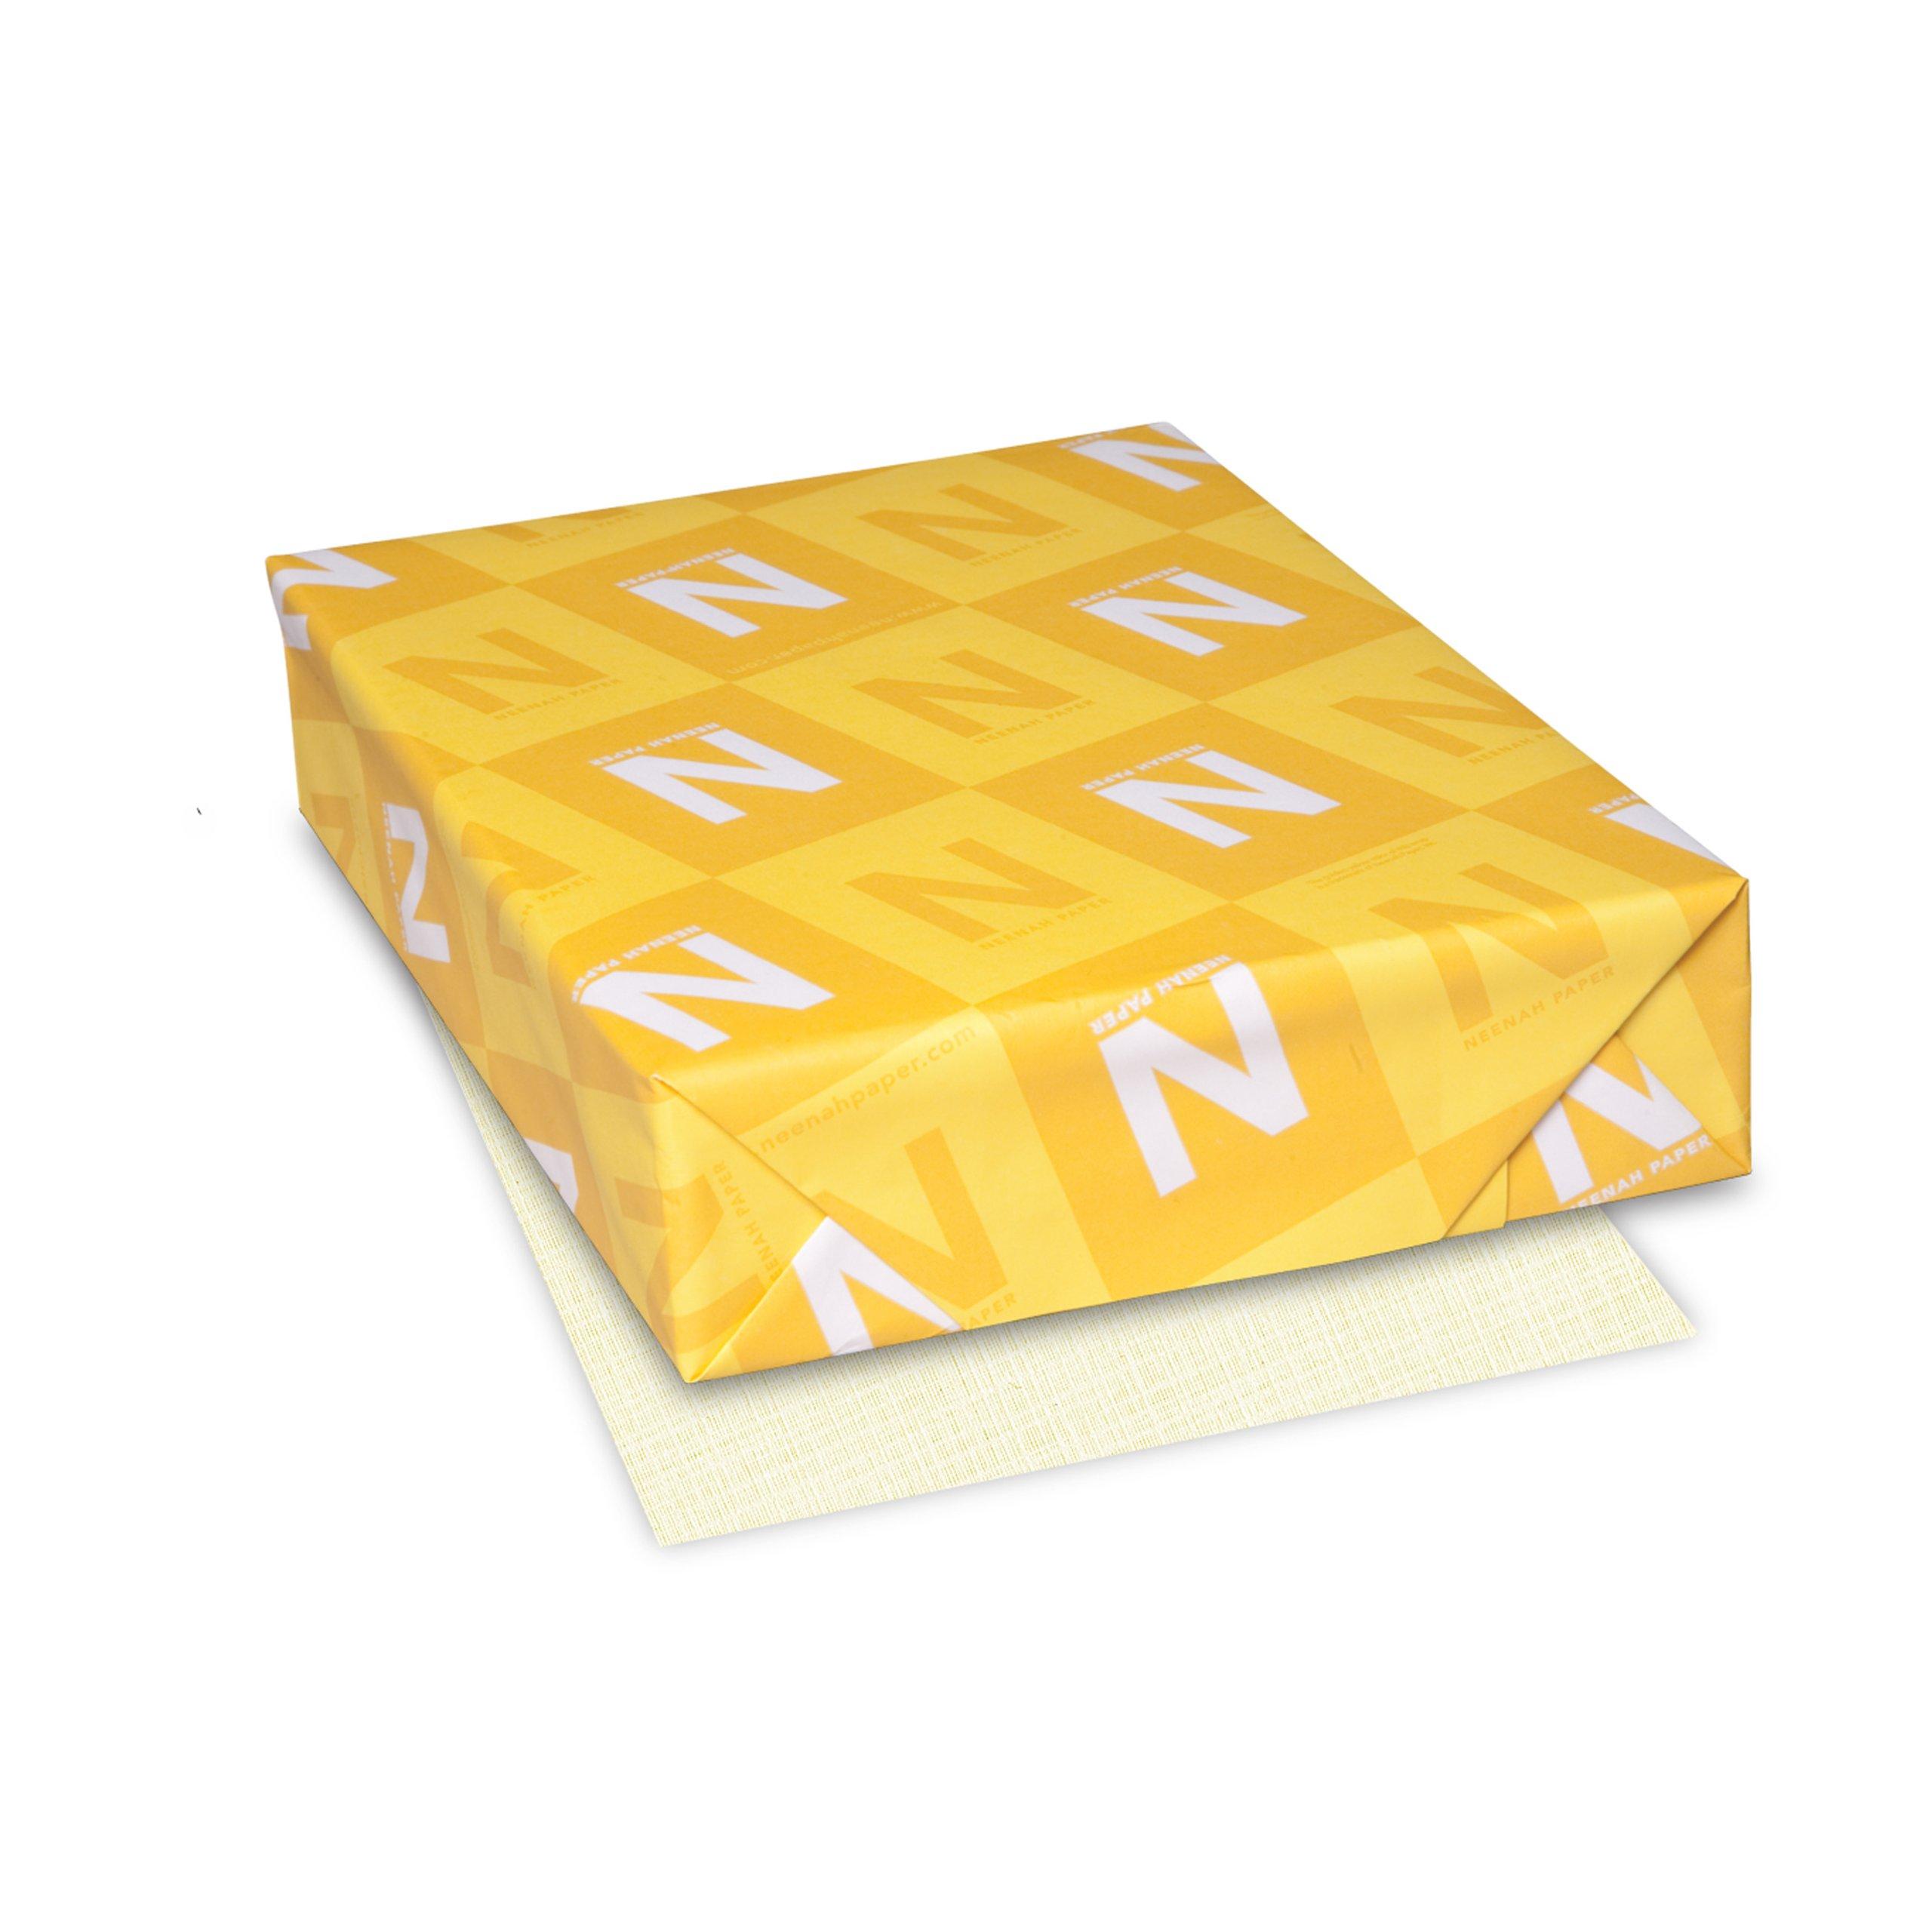 Classic Linen Premium Paper, 8.5'' x 11'', 24 lb, Baronial Ivory, 500 Sheets (05221) by Neenah